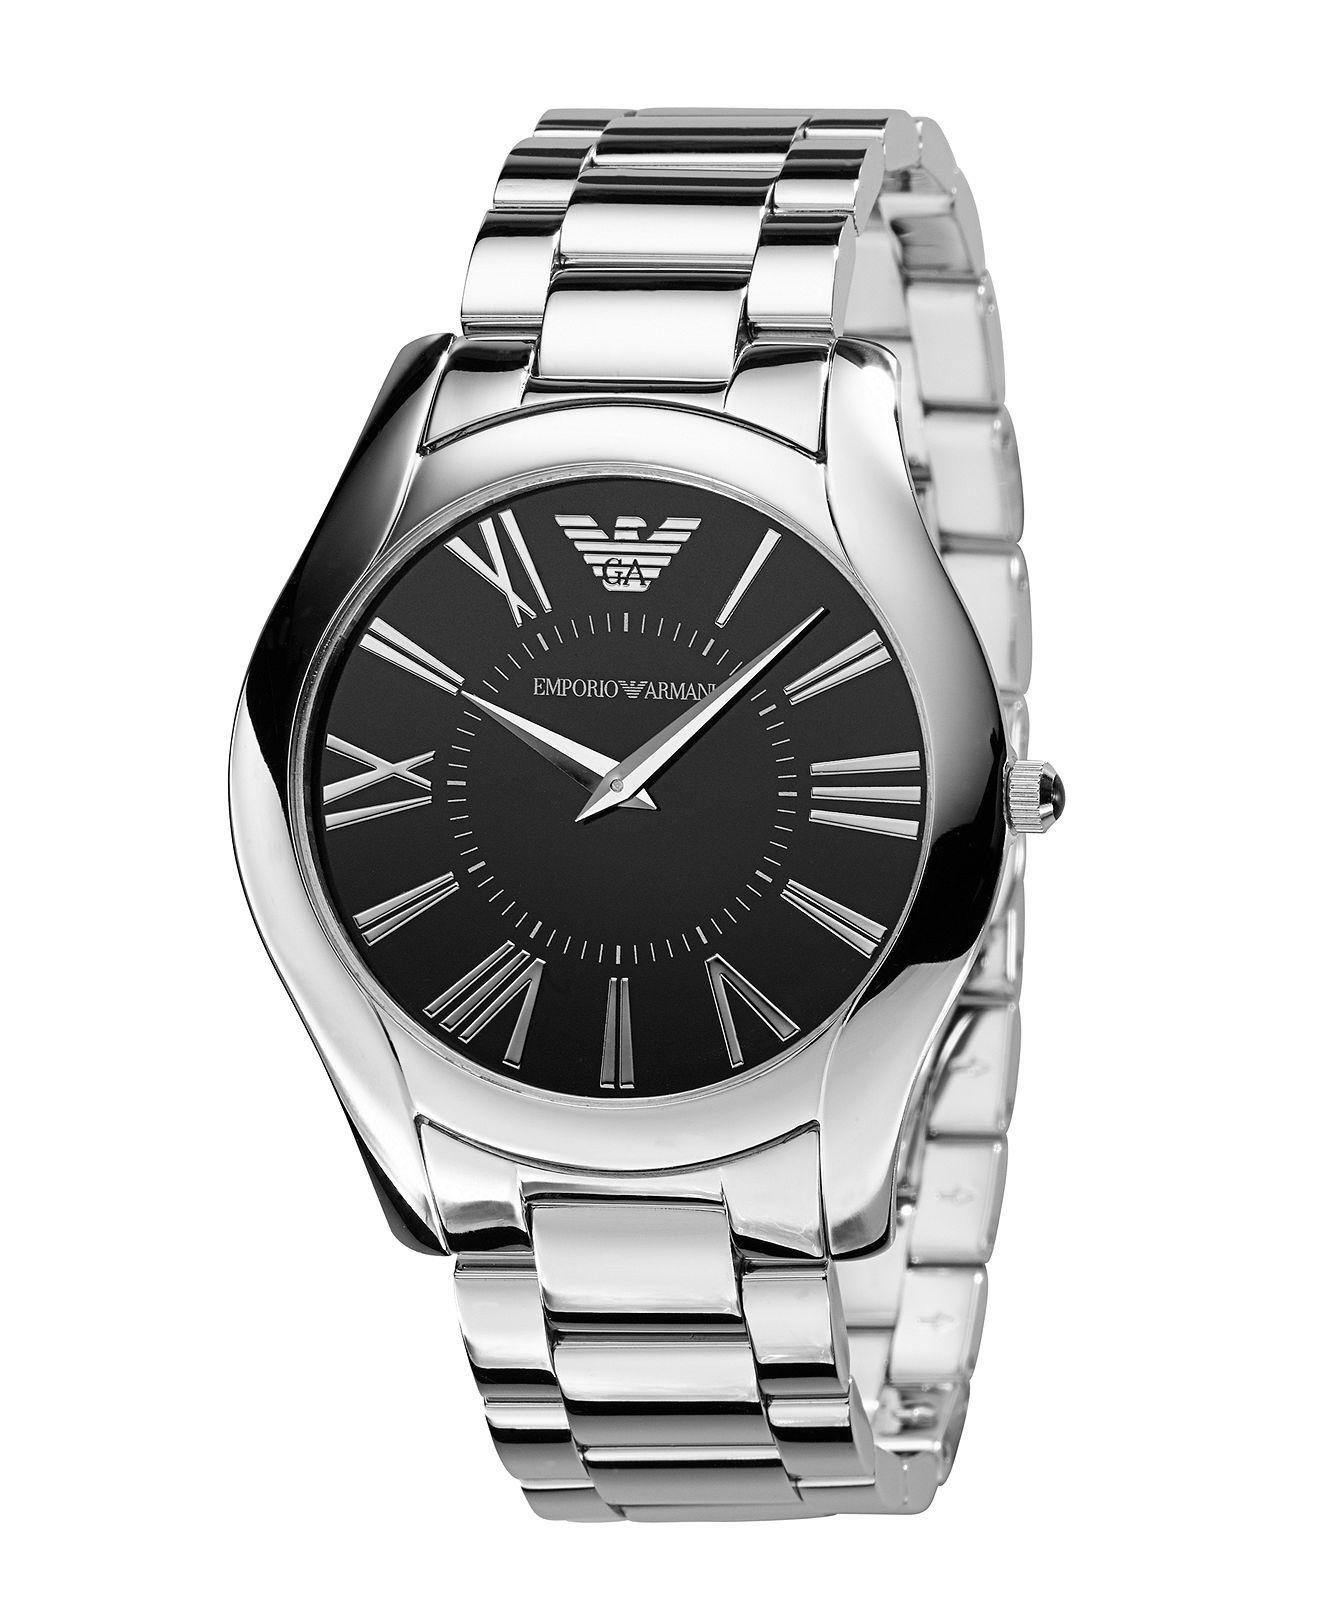 Emporio Armani Watch Mens Stainless Steel Bracelet Ar2022 Casio Edifice Efr 547l 7avudf Jam Tangan Pria Genuine Leather Brown Watches Jewelry Macys